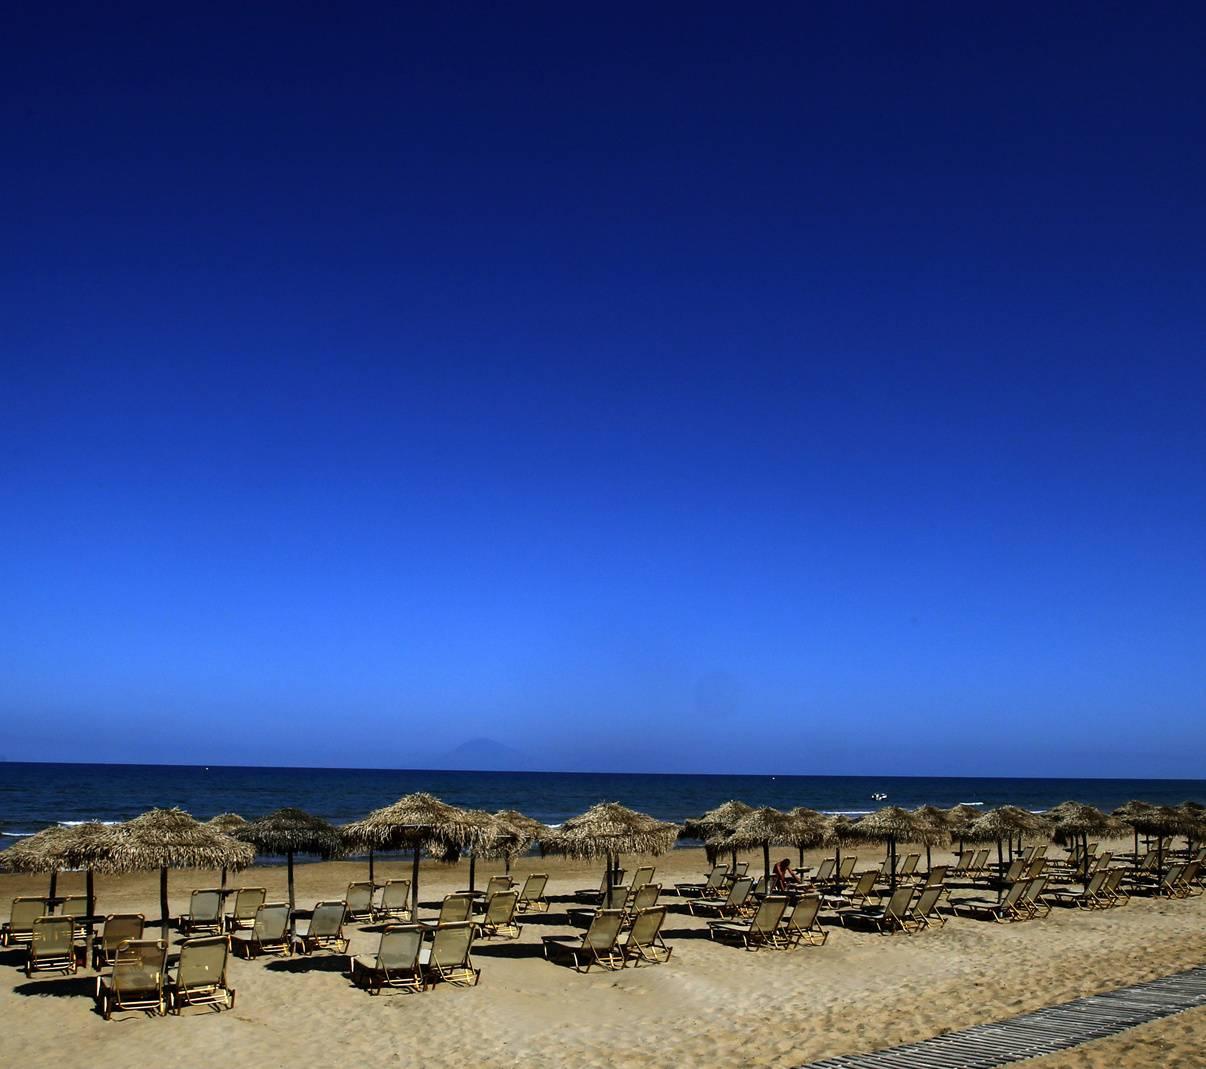 Vz Beach